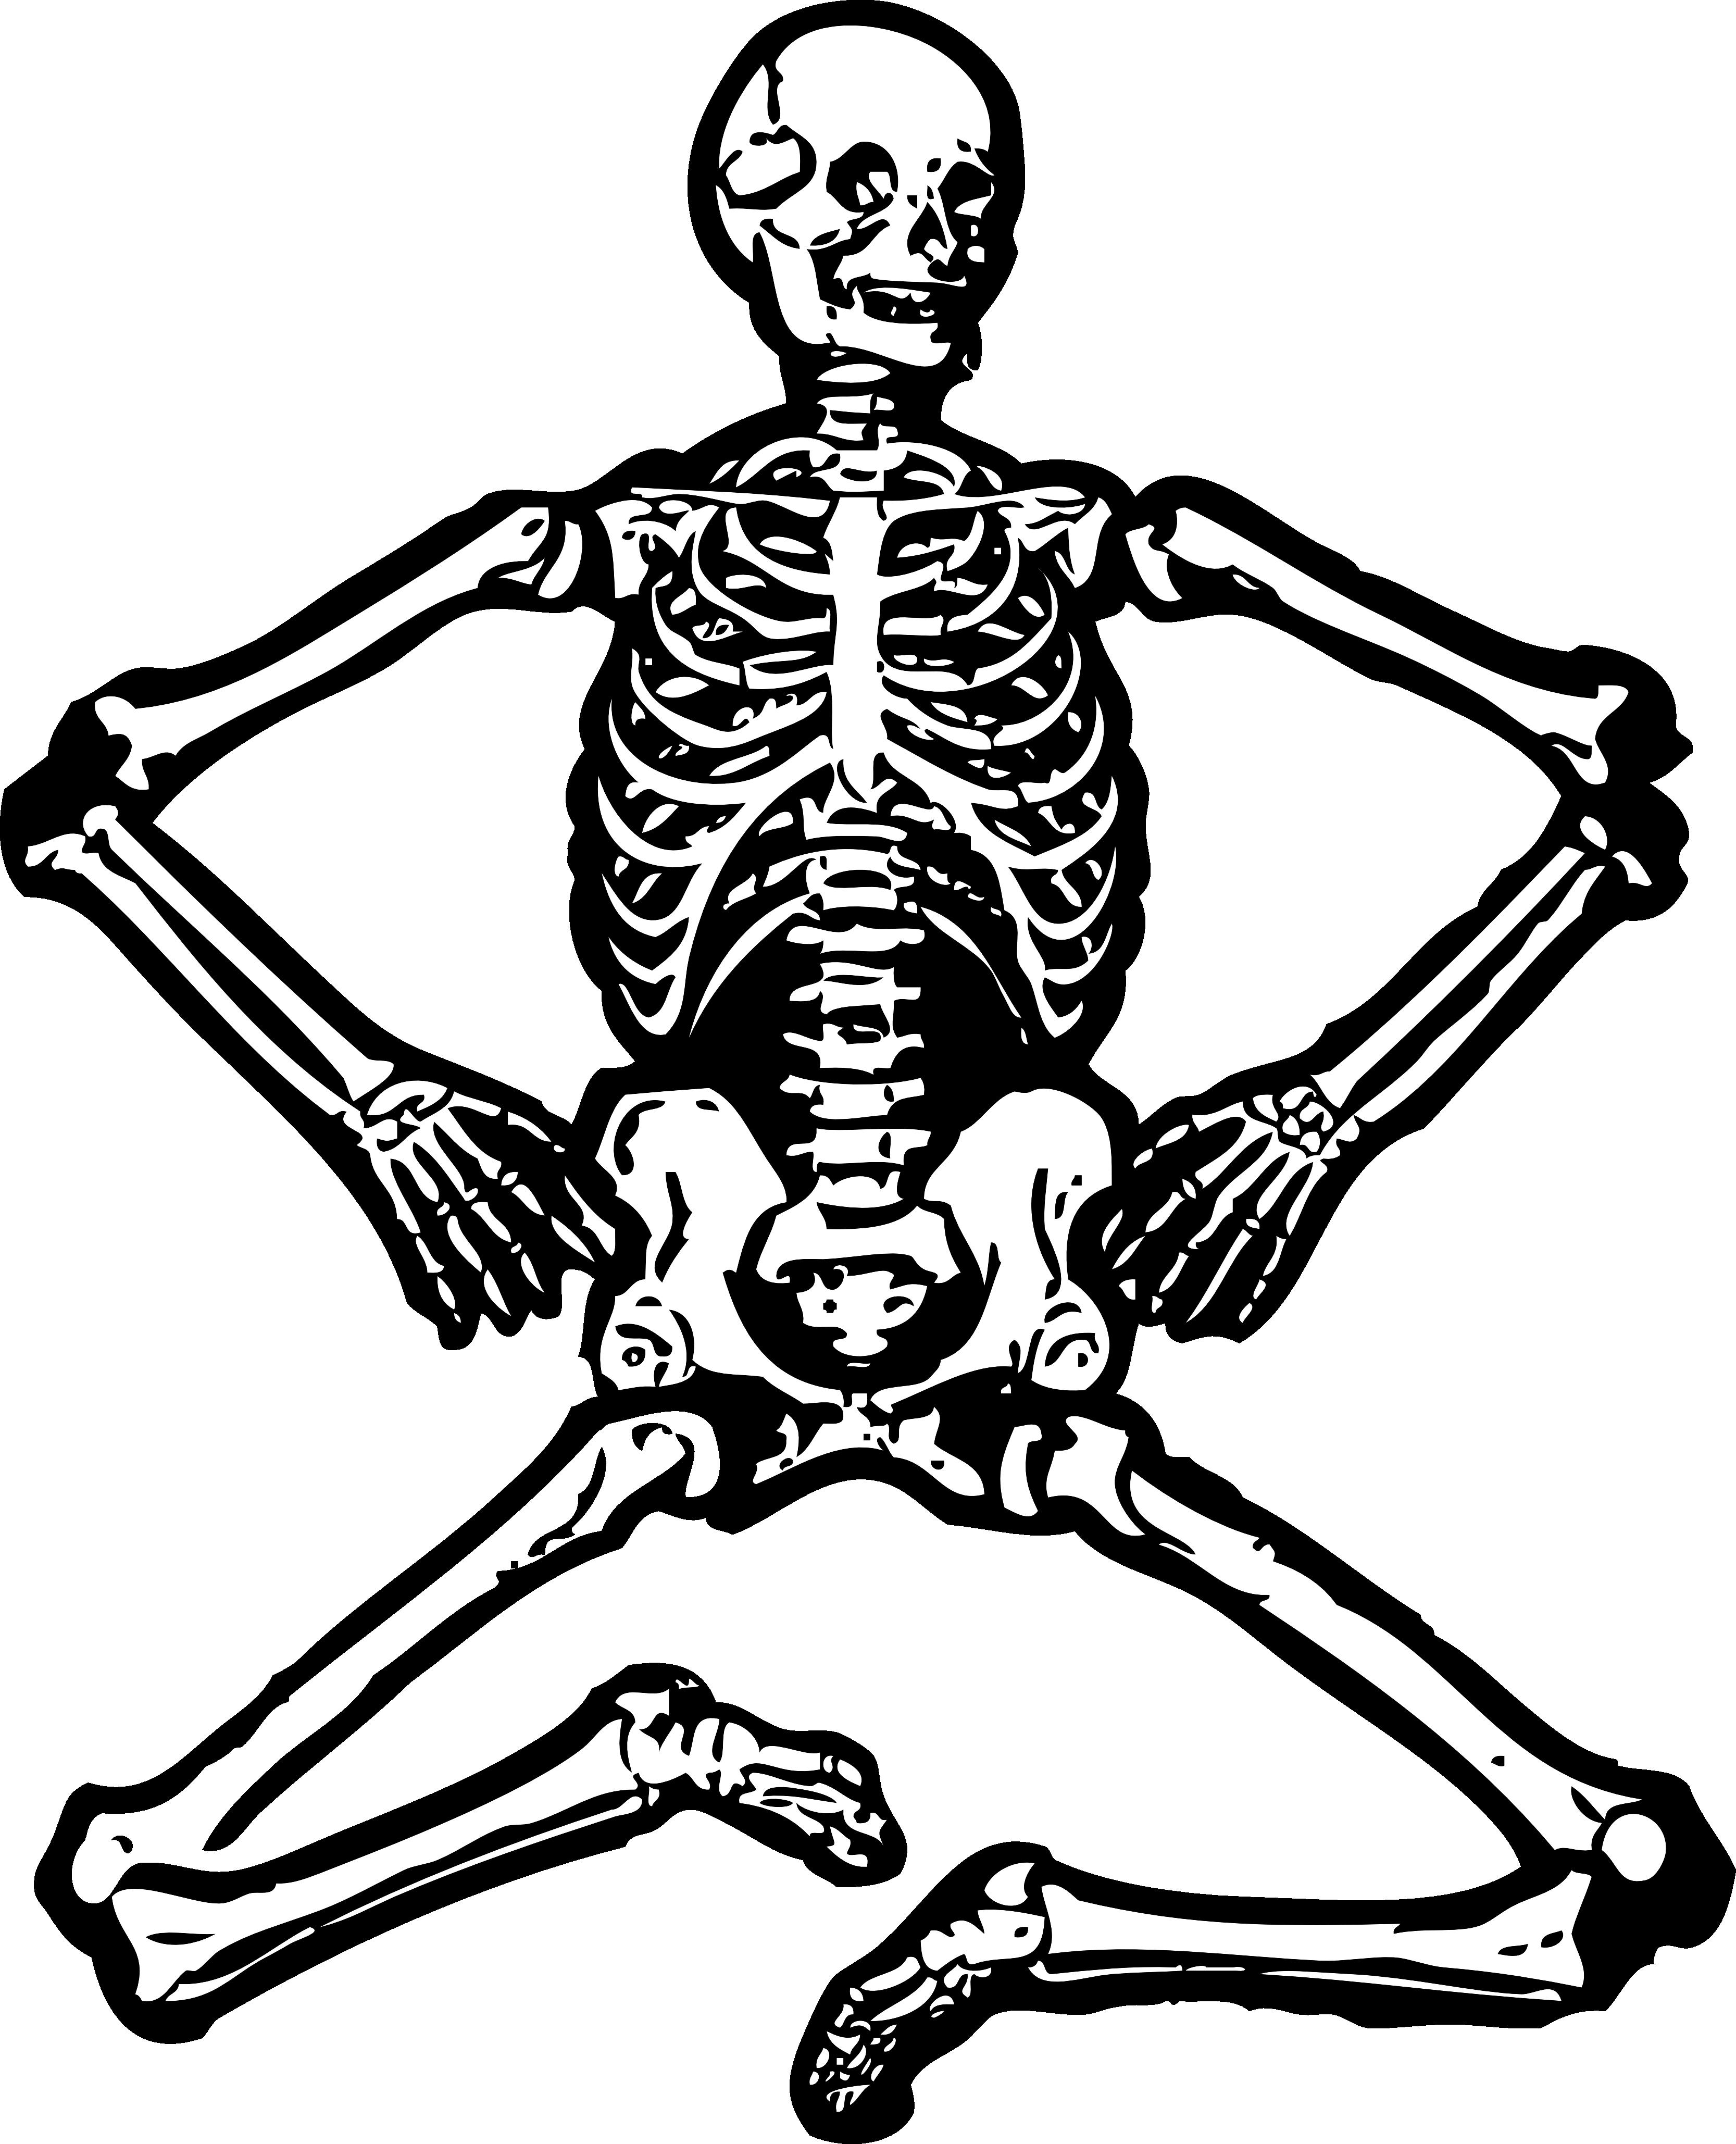 Skeleton clip art free clipart images 3.